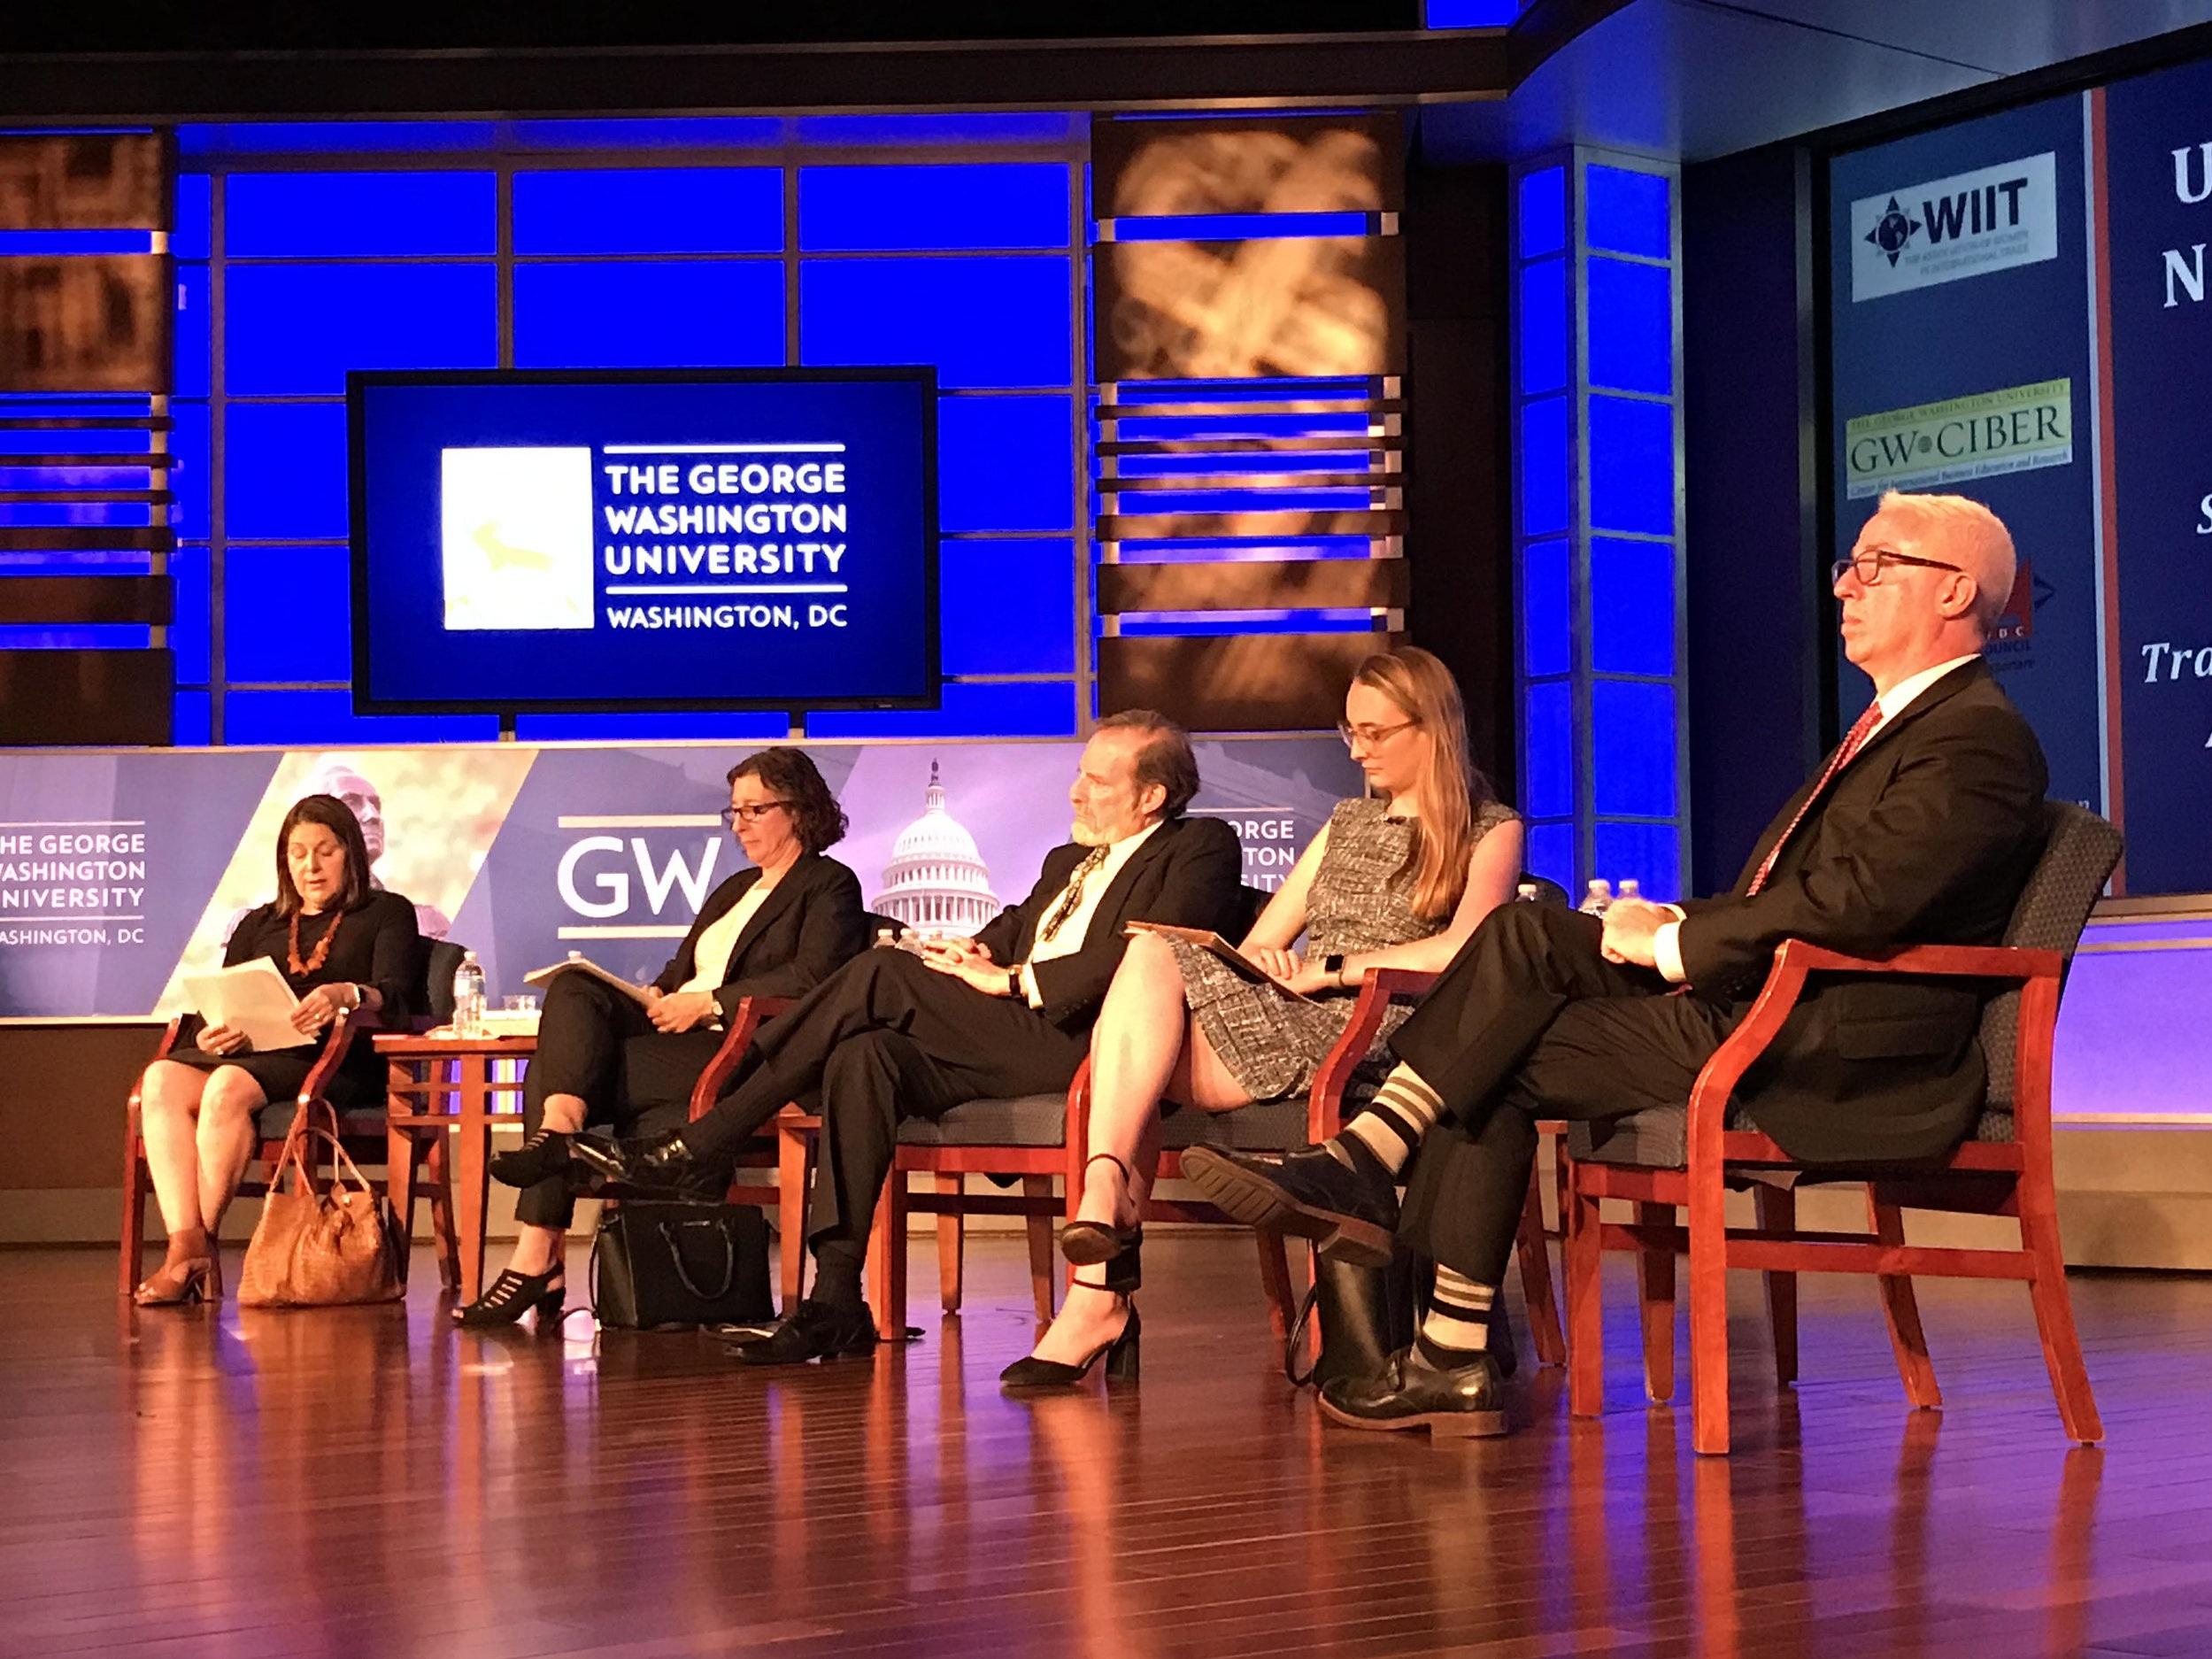 George Washington University - Understanding Trump's National Security Tariffs